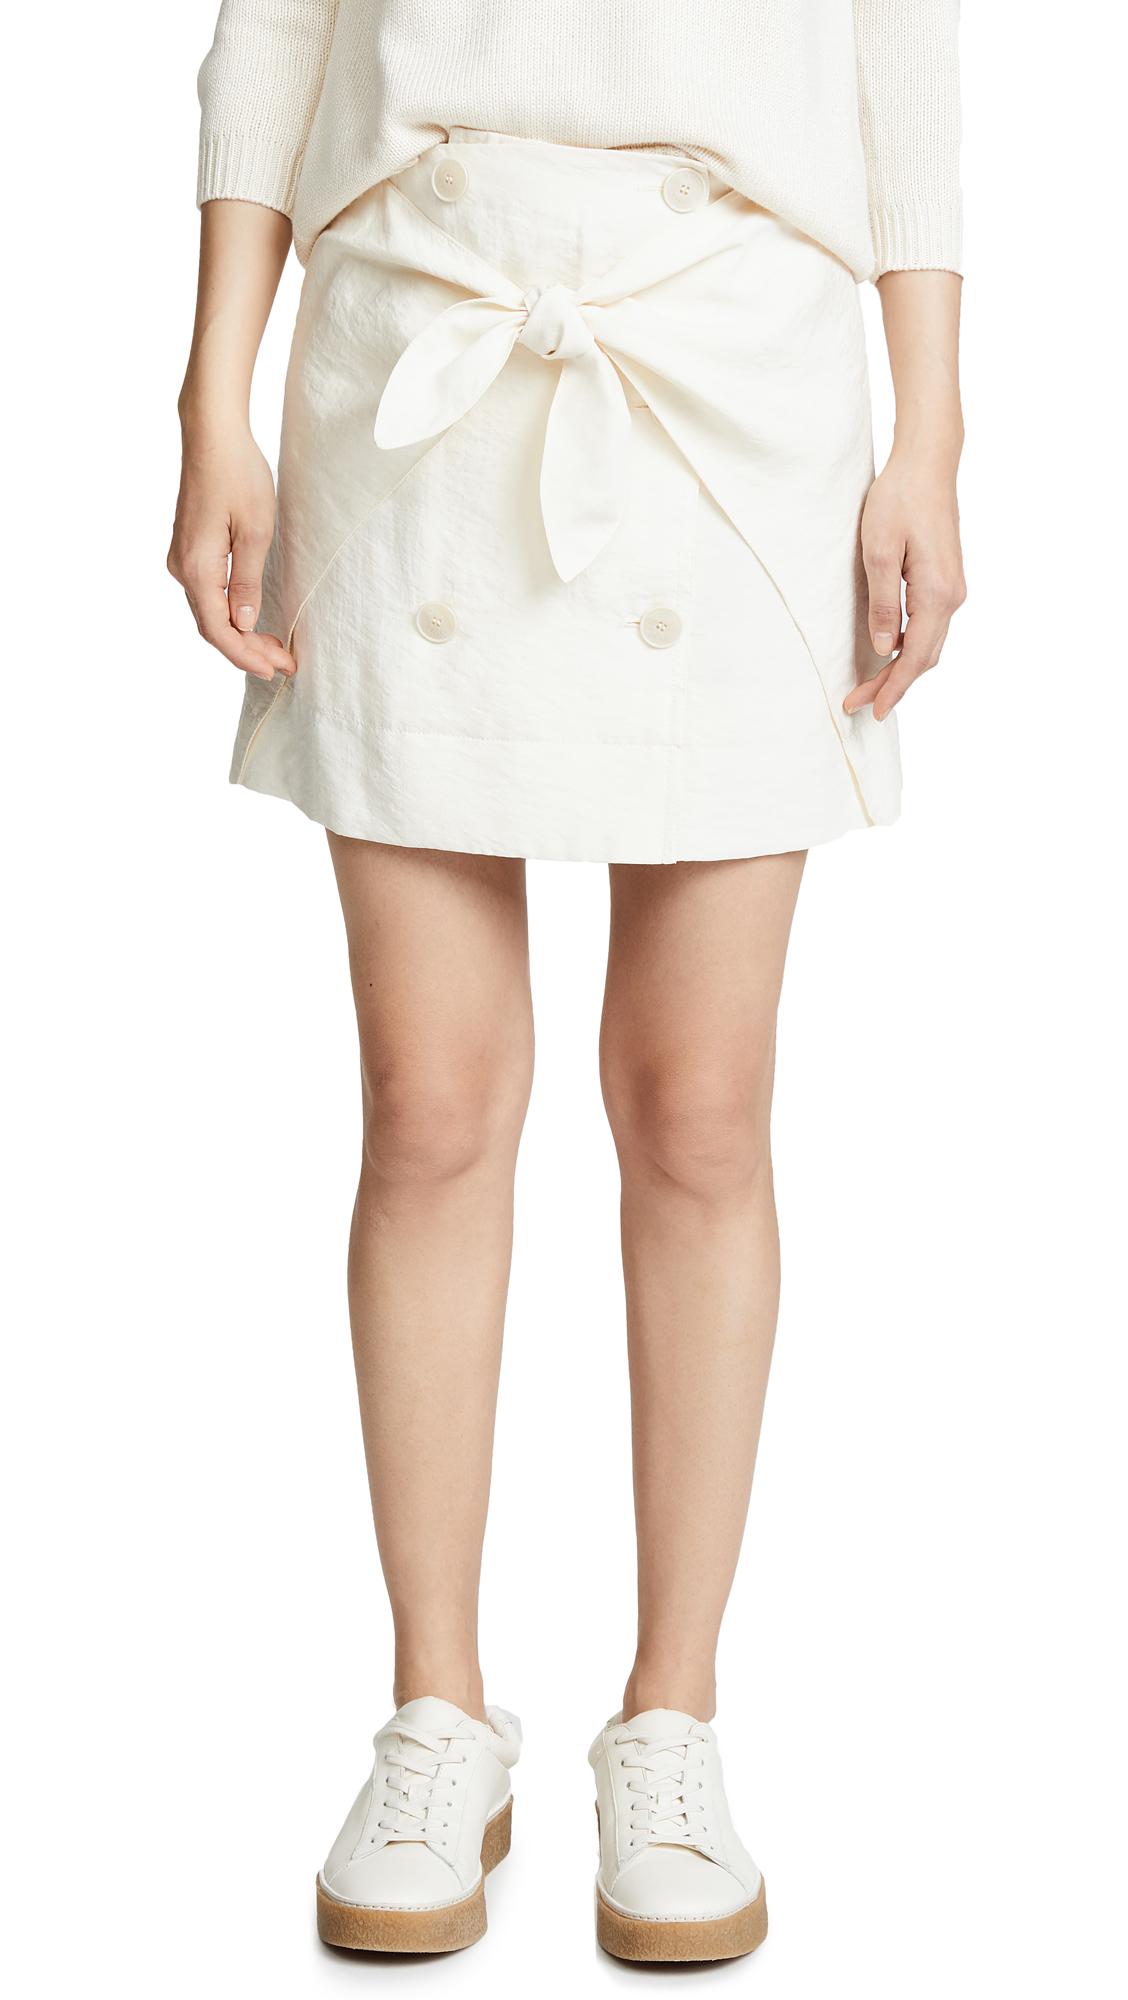 Sonia Rykiel Wrap Front Skirt In Dune